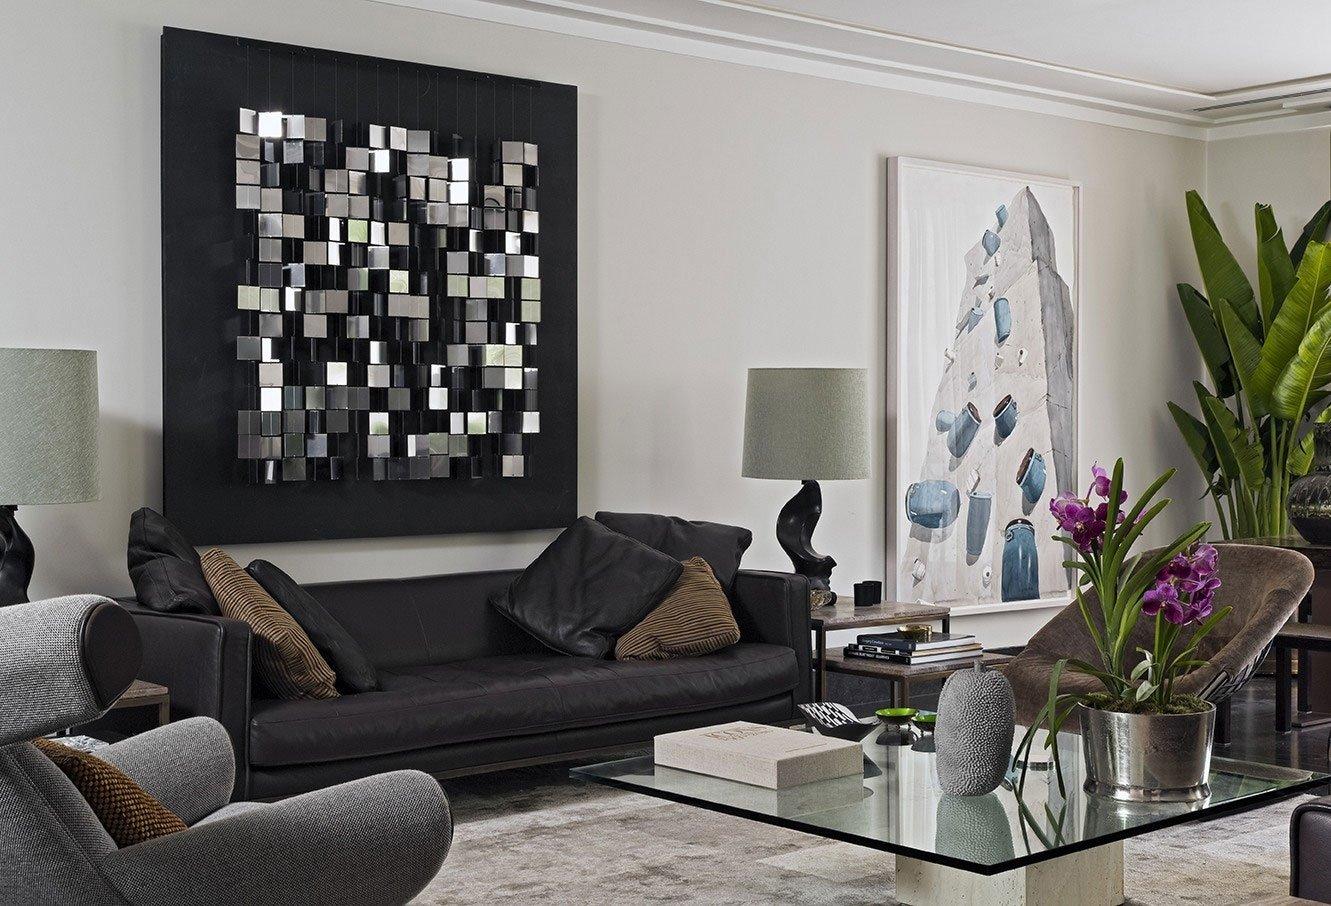 10 Most Popular Wall Art Ideas For Living Room mozaic wall art decor for living room ideas of wall art decor for 2 2020